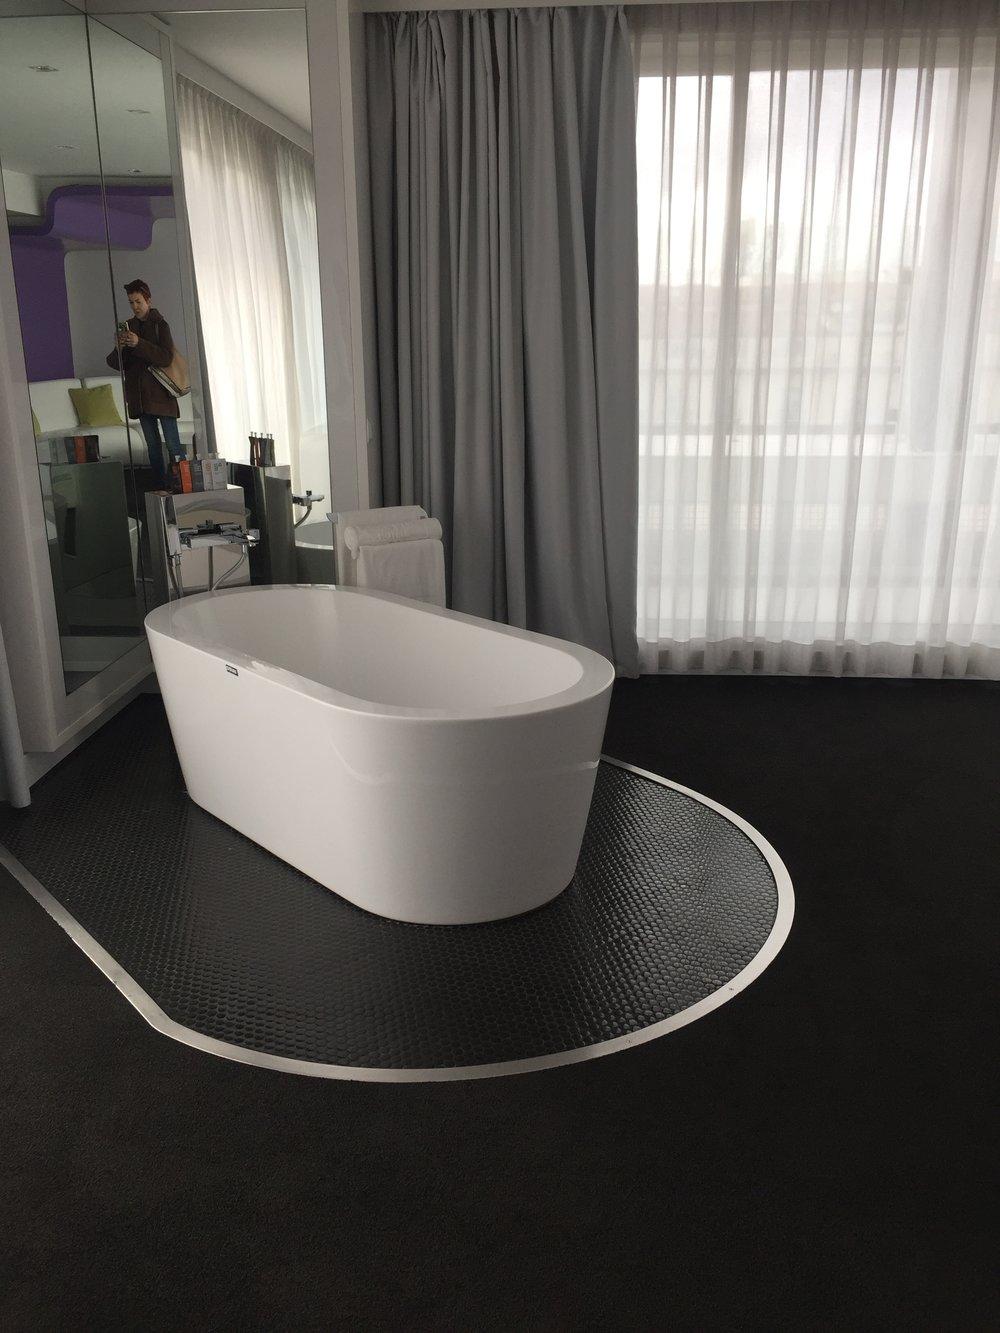 Fantasy world - free standing bath!